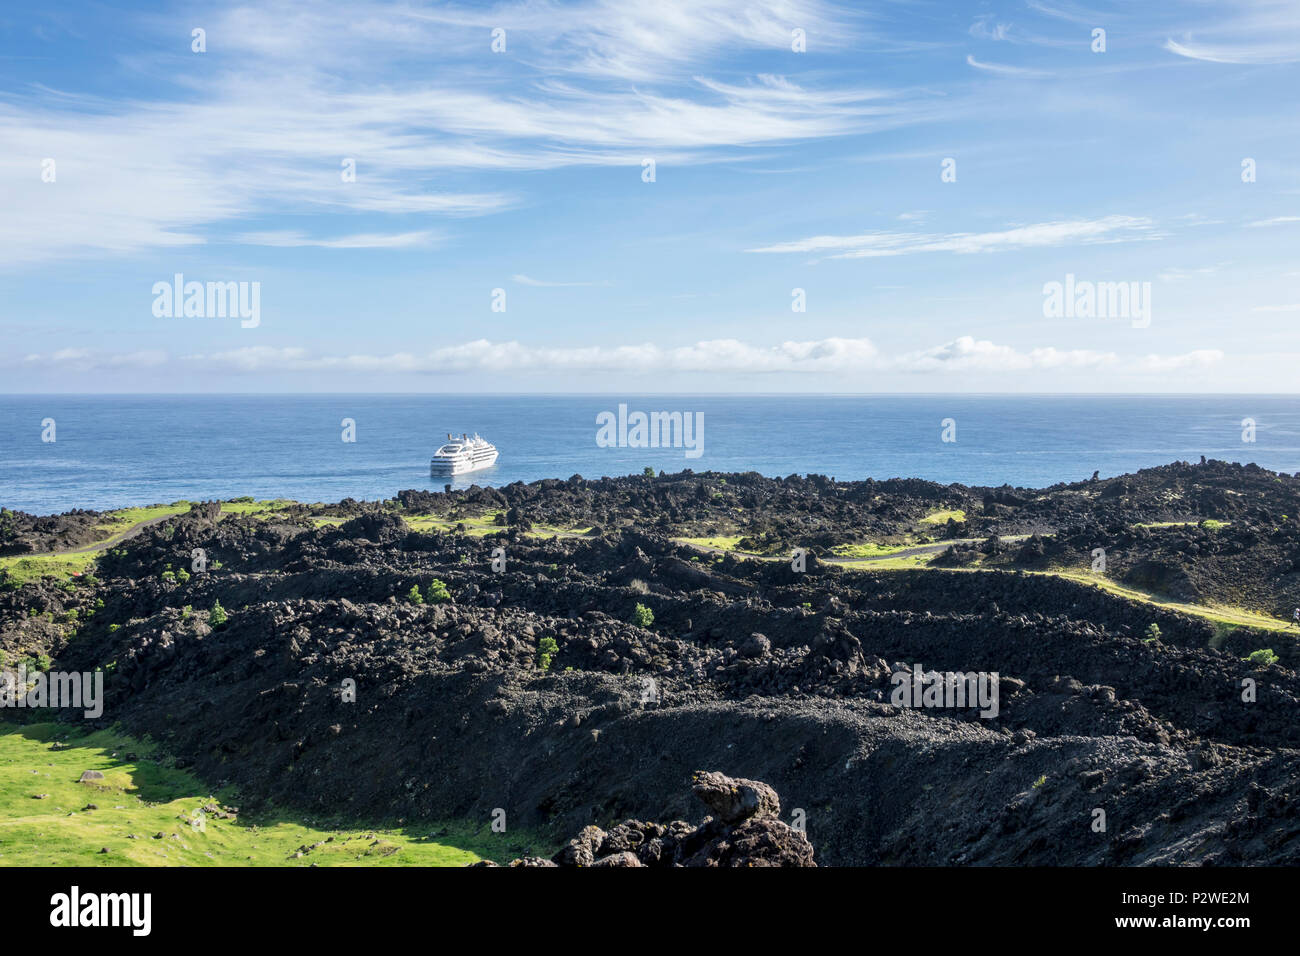 Tristan da Cunha, British Overseas Territories, South Atlantic Ocean - Stock Image